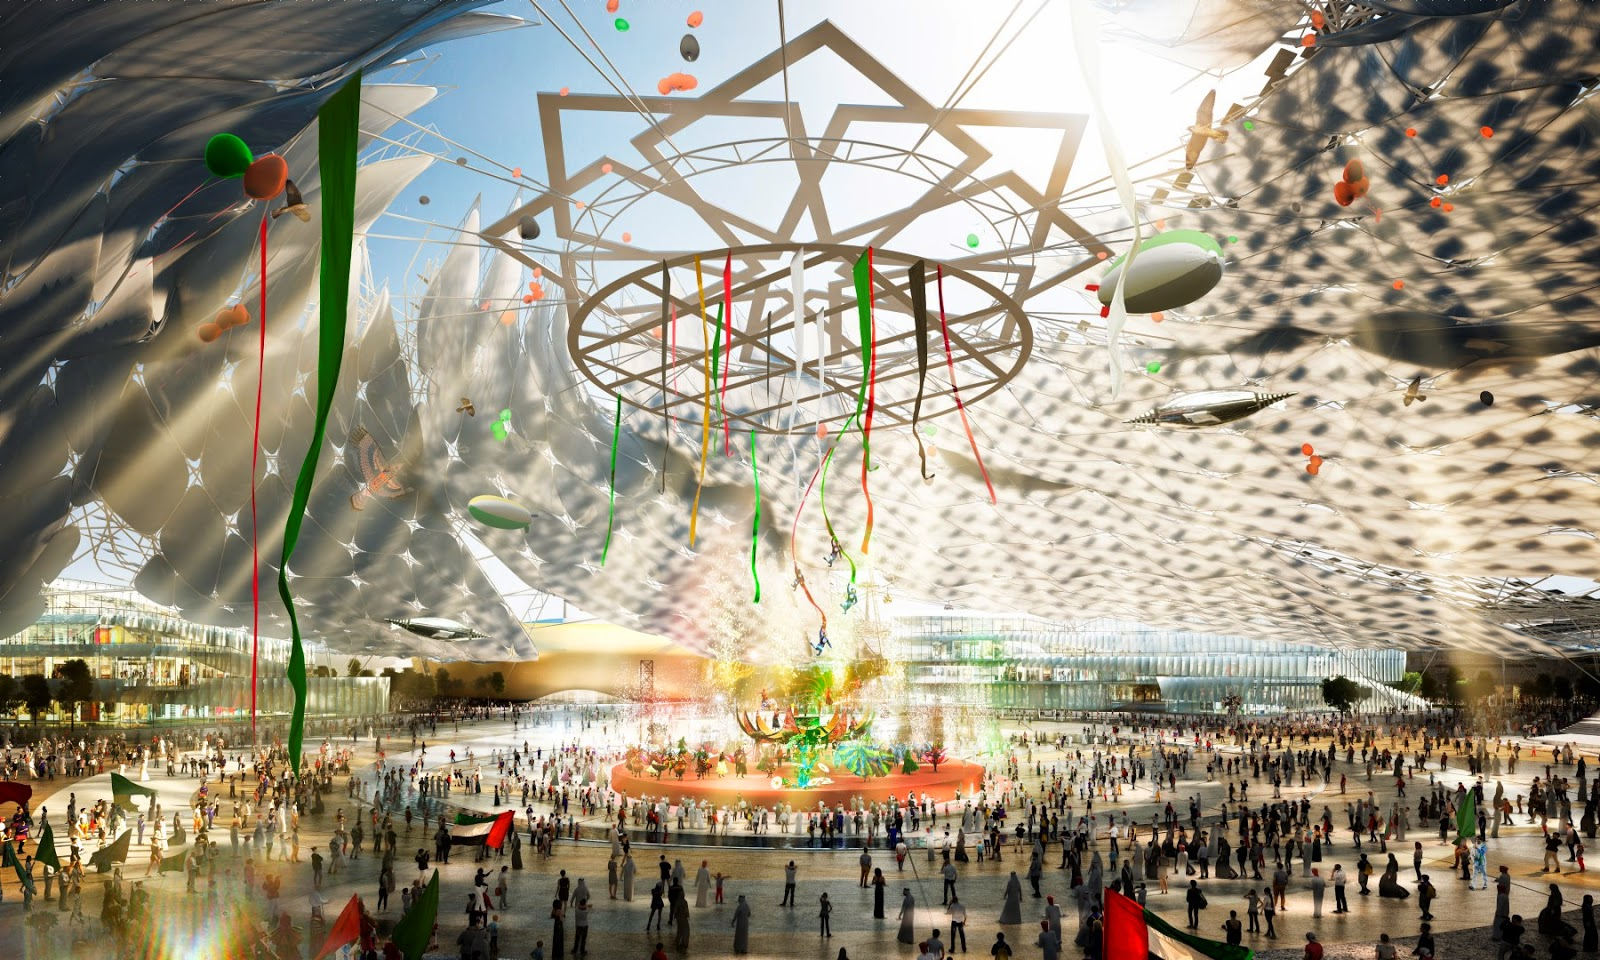 Expo 2020 three-year countdown Event in Dubai